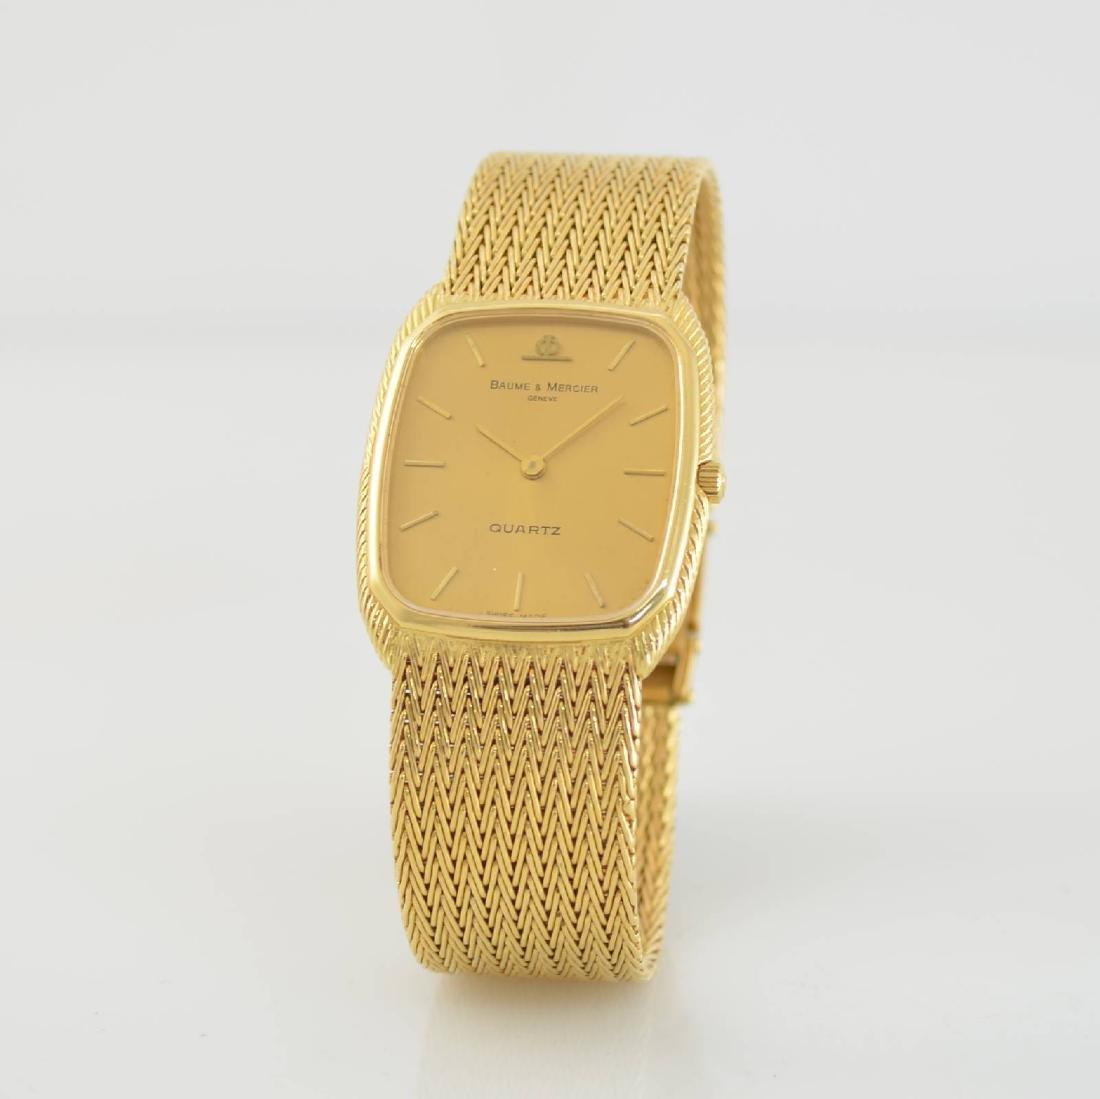 BAUME & MERCIER 18k yellow gold wristwatch - 3